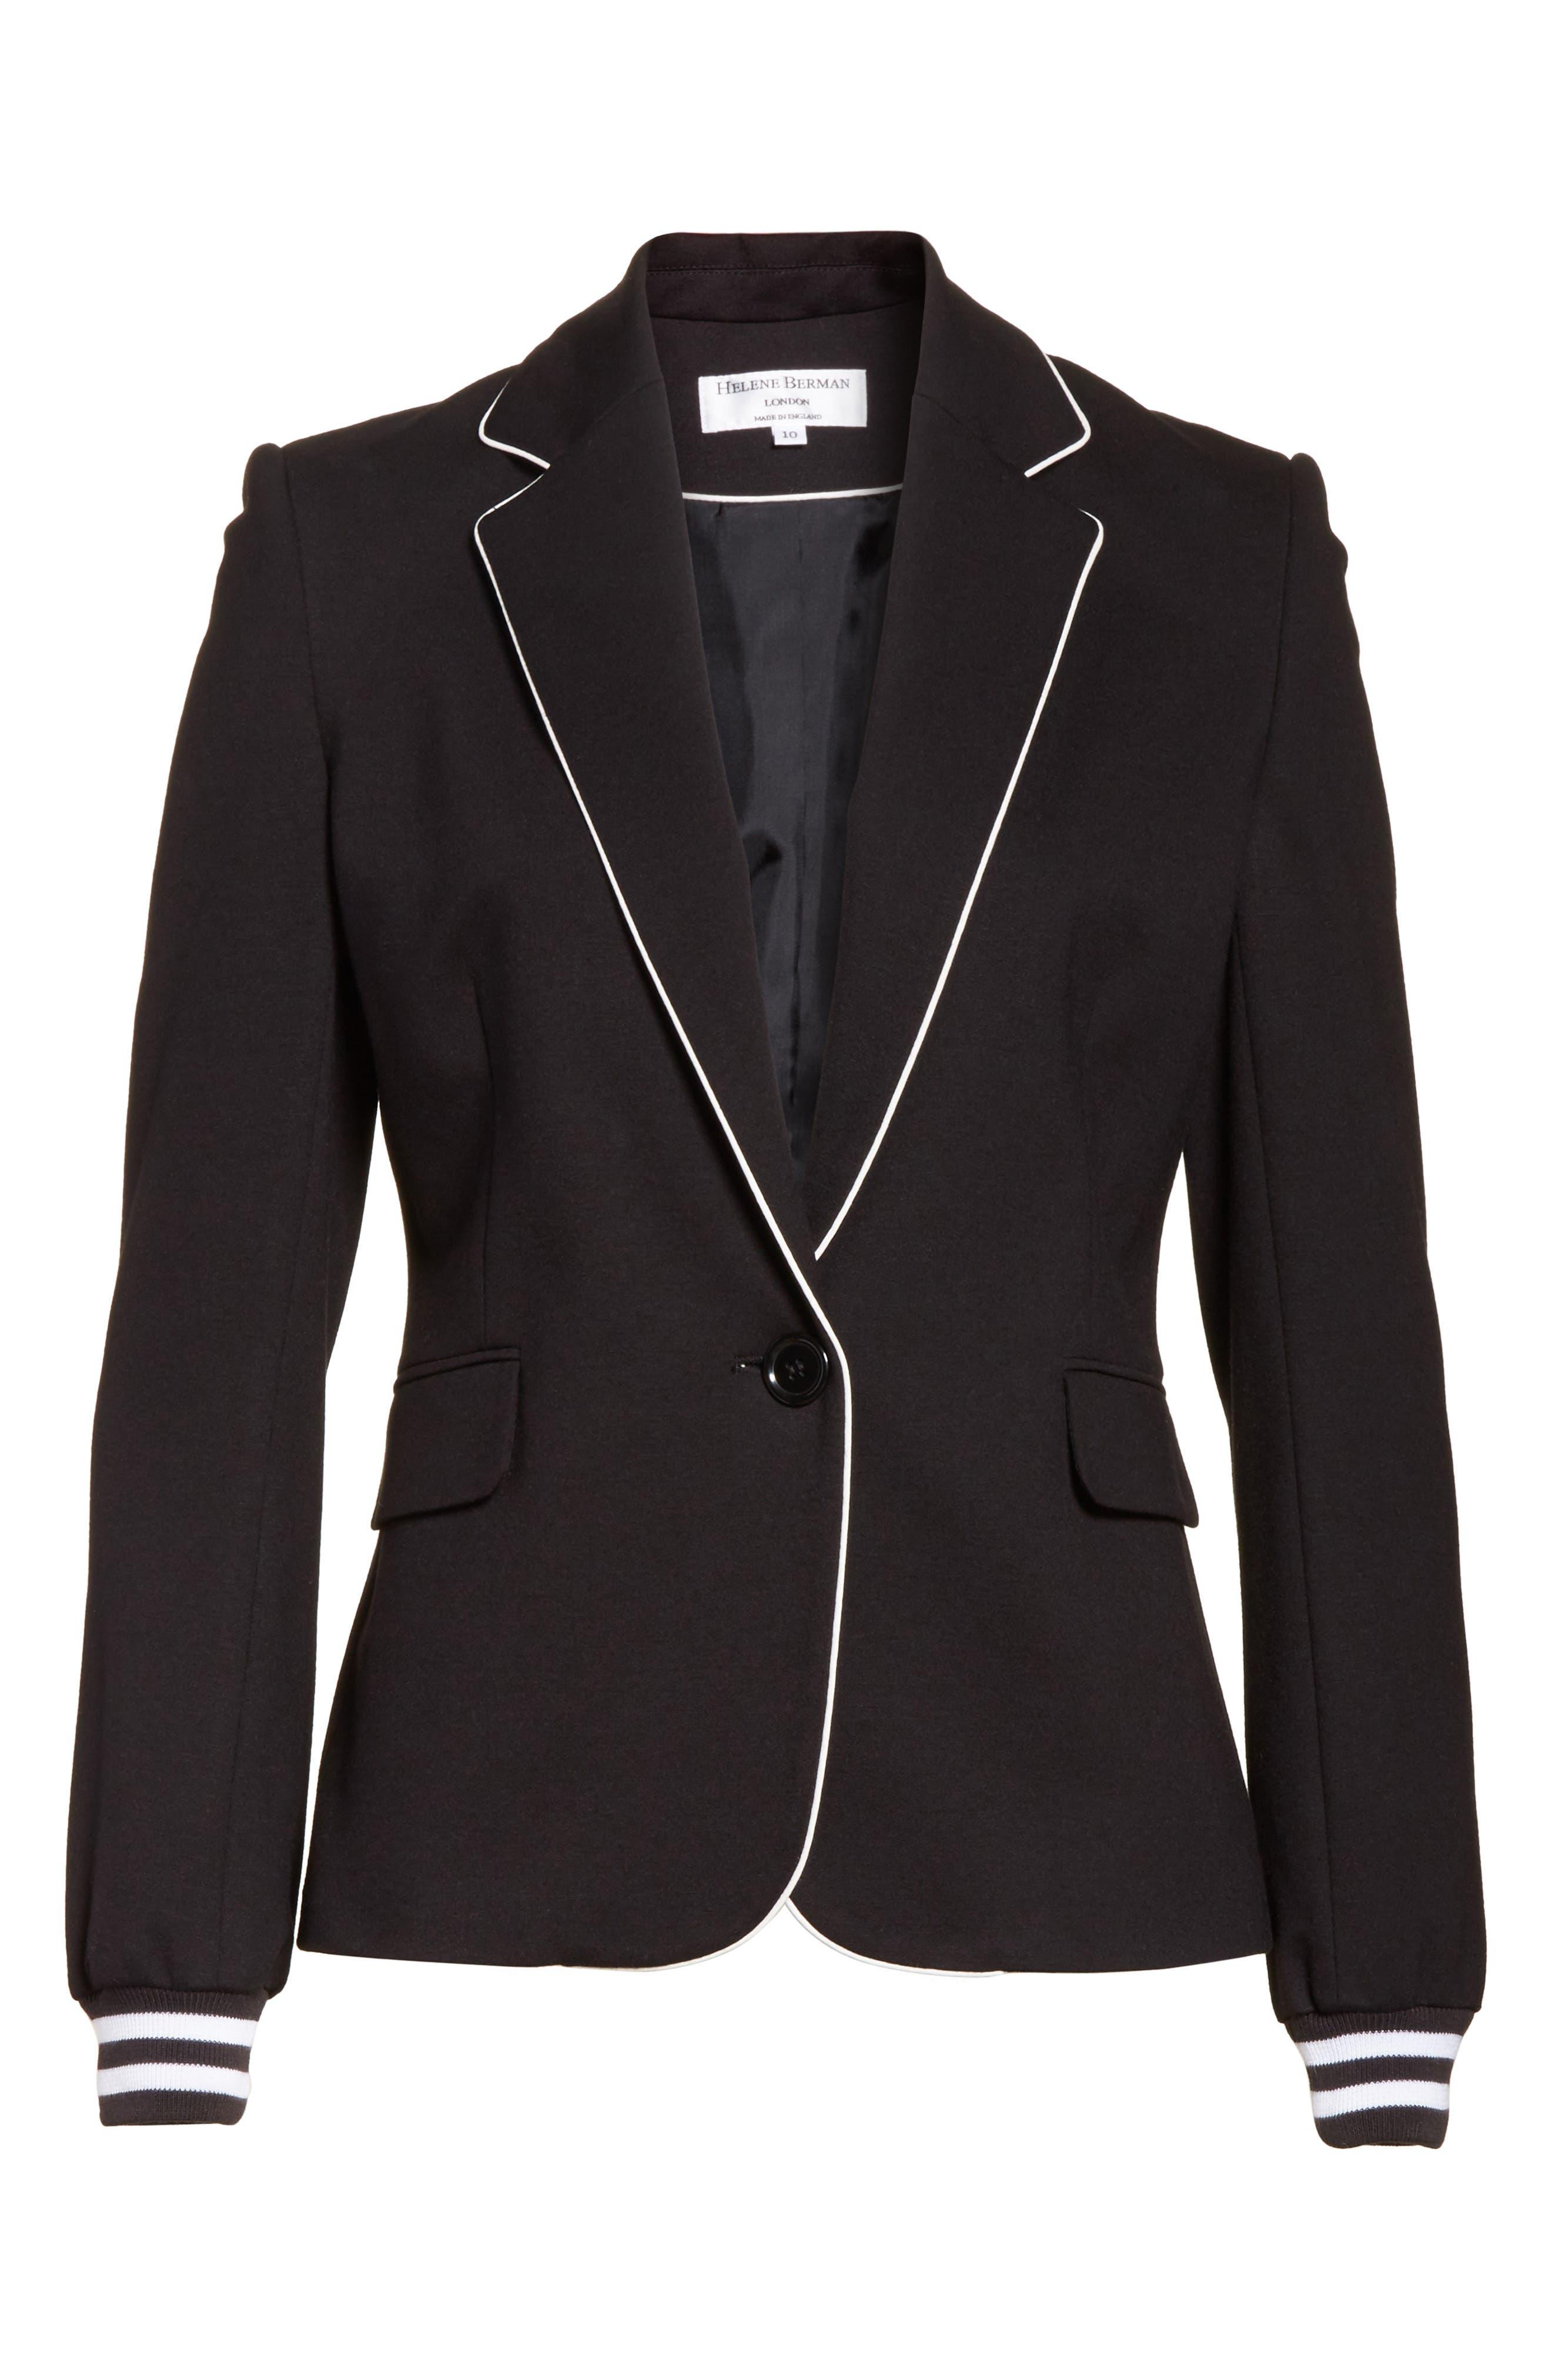 Piped Jersey Blazer,                             Alternate thumbnail 6, color,                             Black/ White